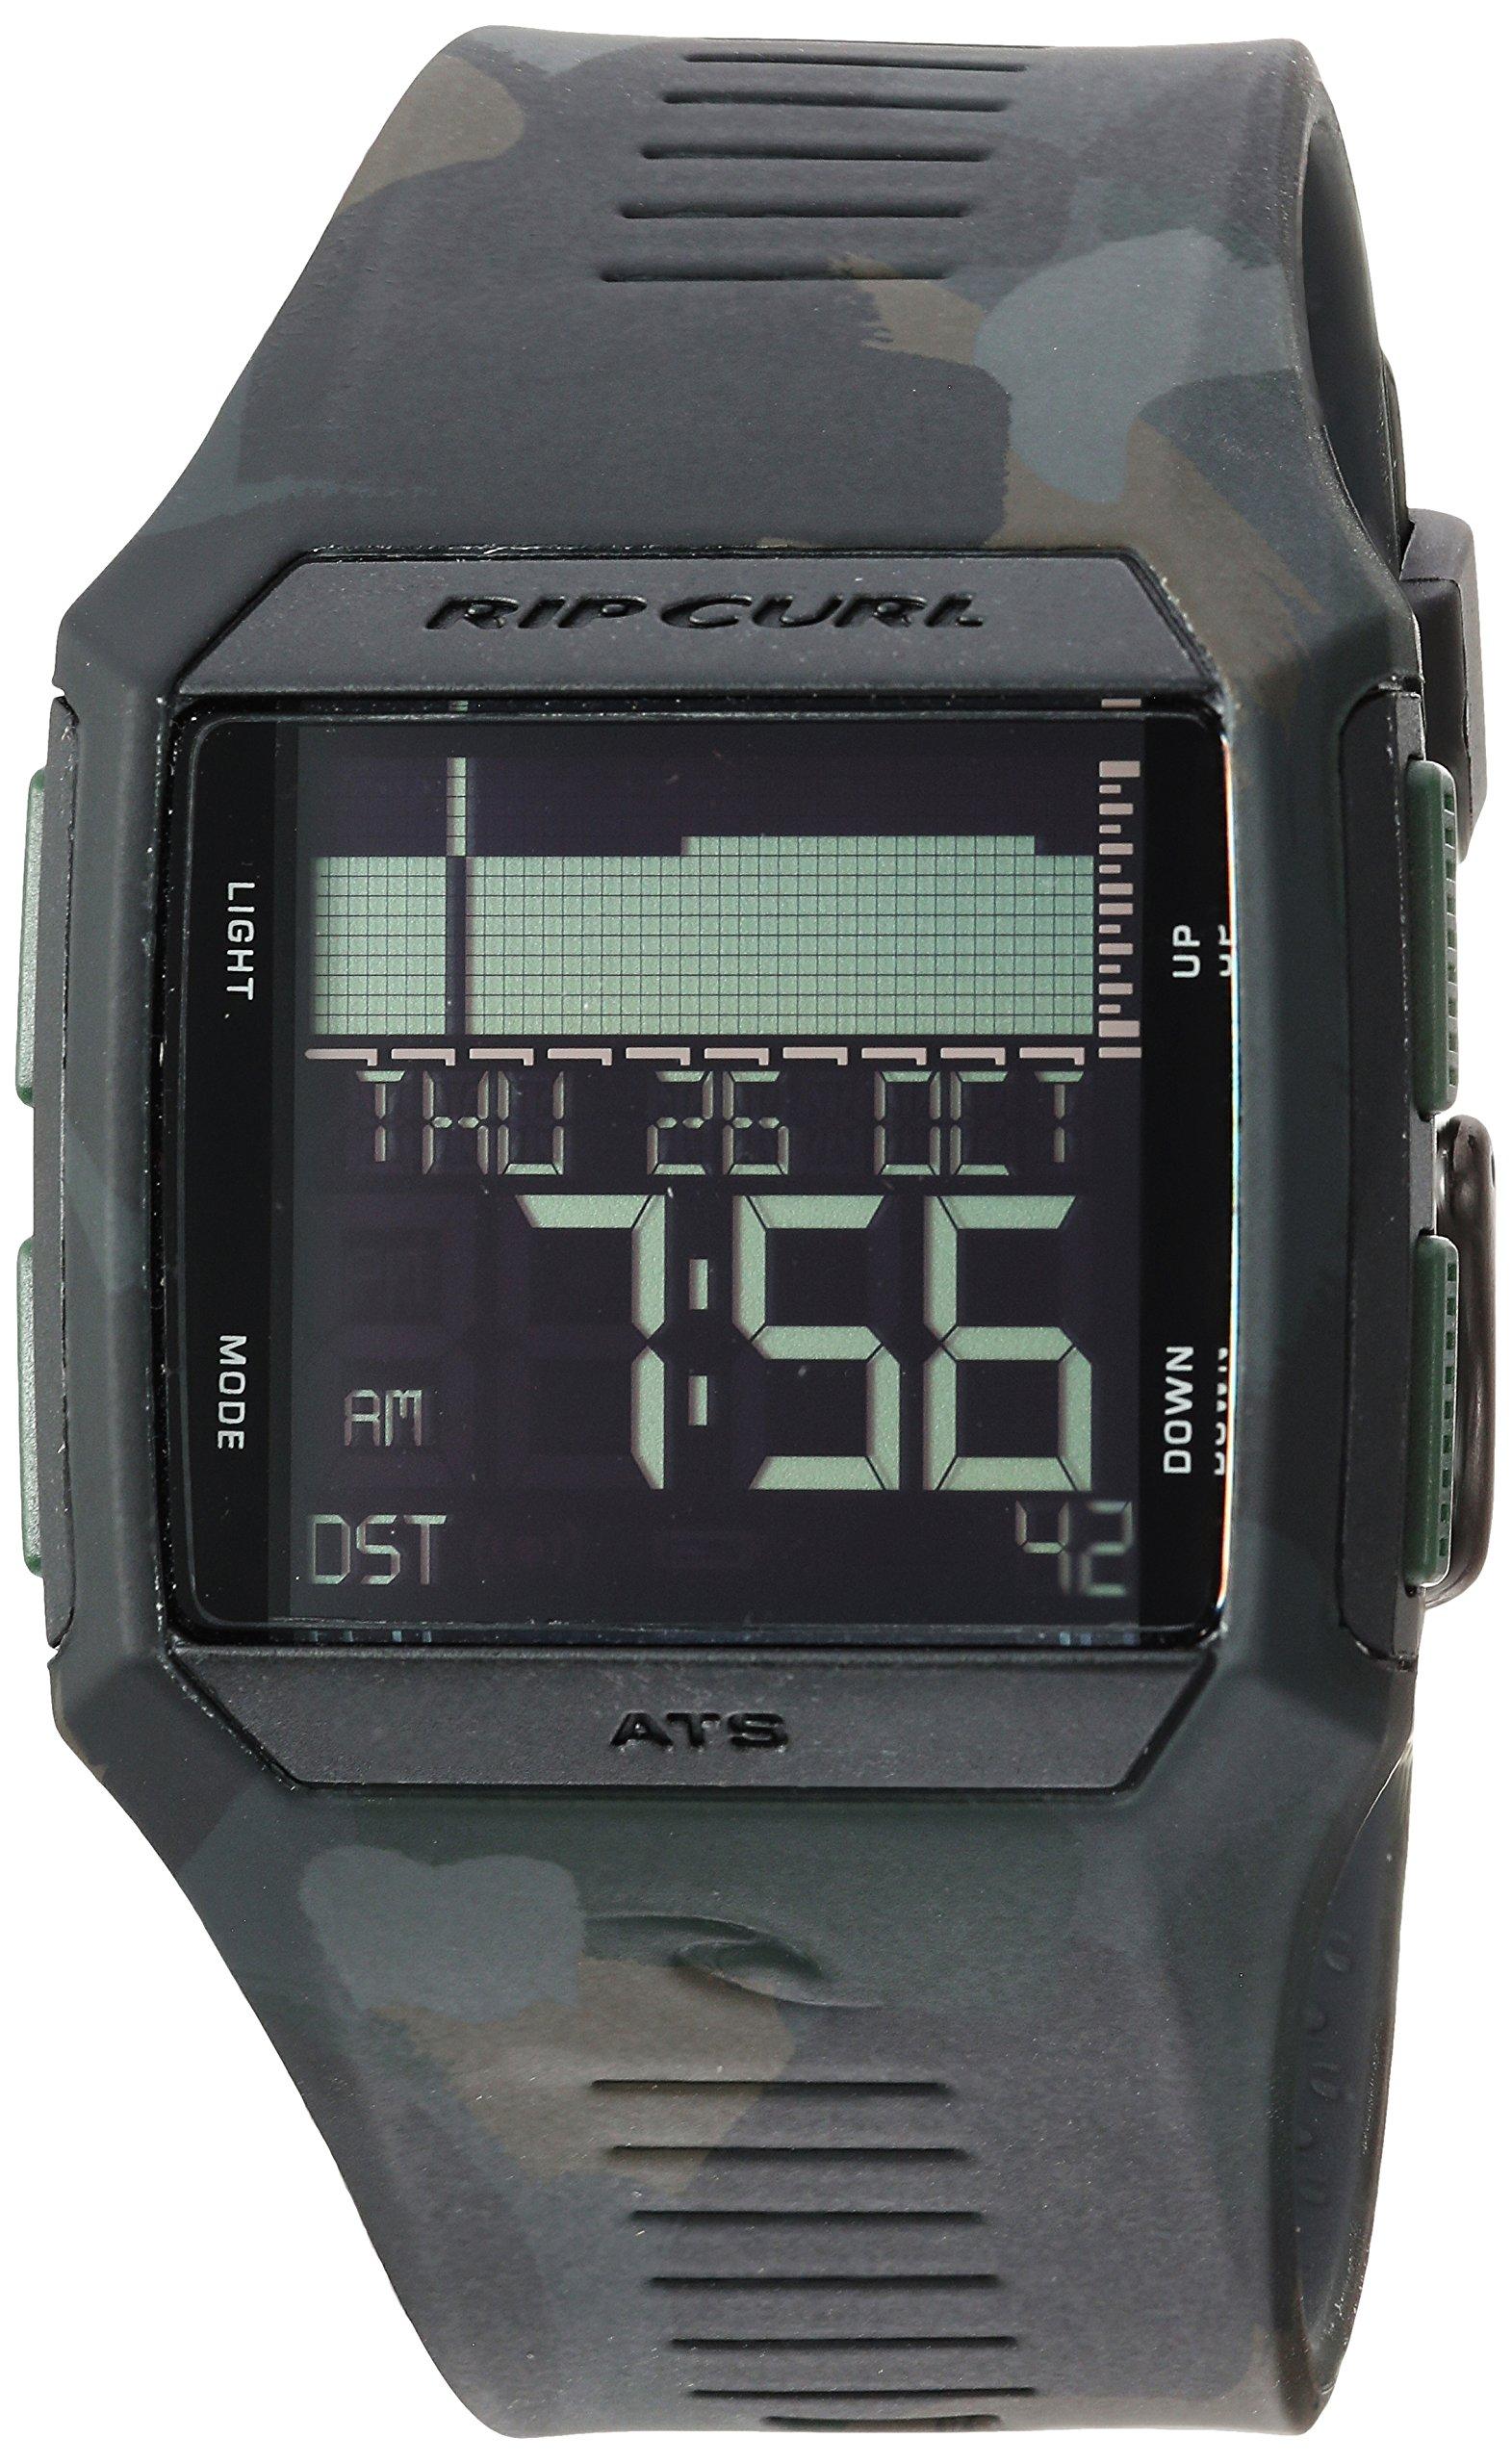 Rip Curl Men's Analog-Quartz Sport Watch with Polyurethane Strap, Multi, 28 (Model: A1128JUN1SZ) by Rip Curl